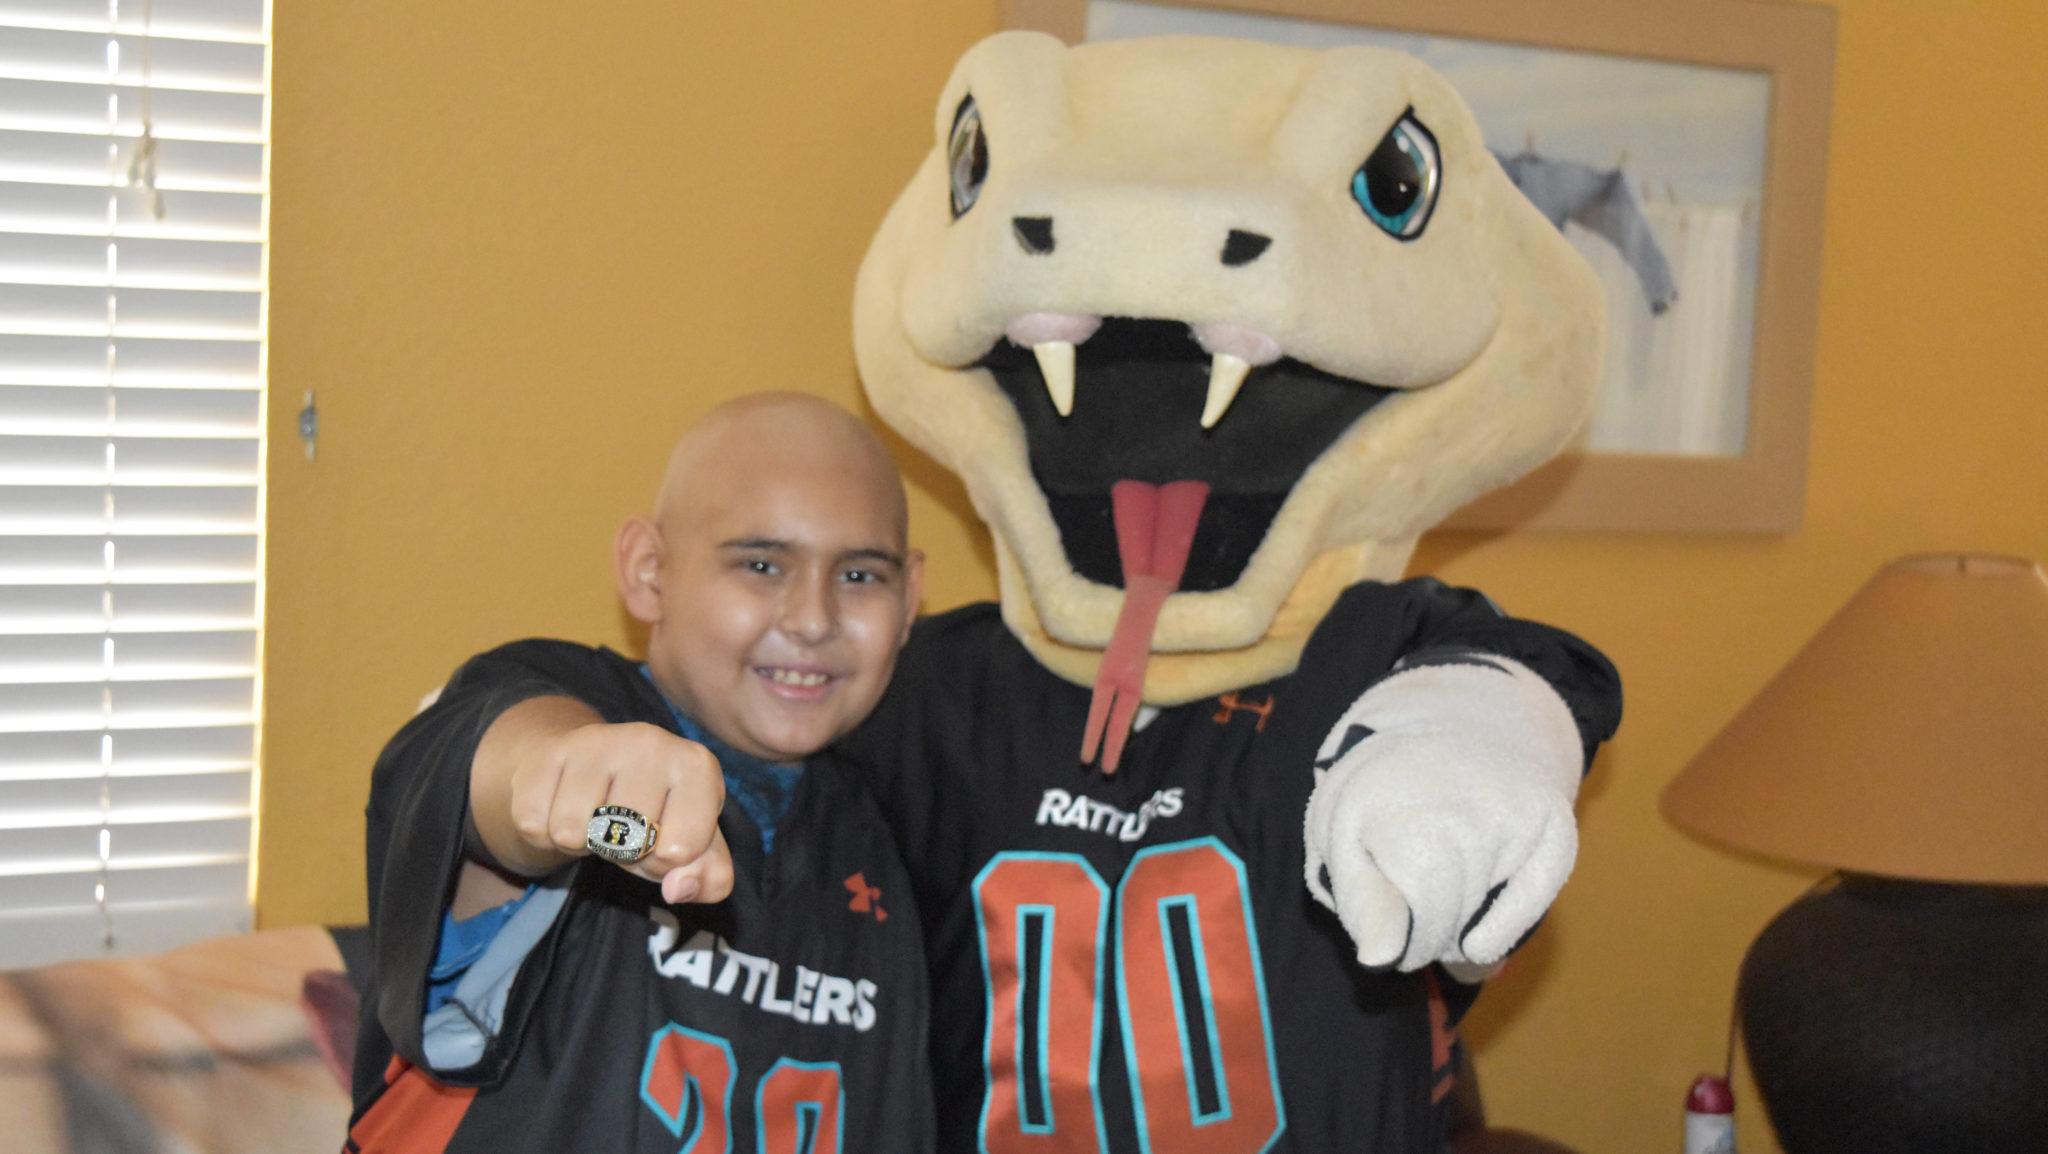 Teenage boy poses with the Arizona Rattlers' mascot